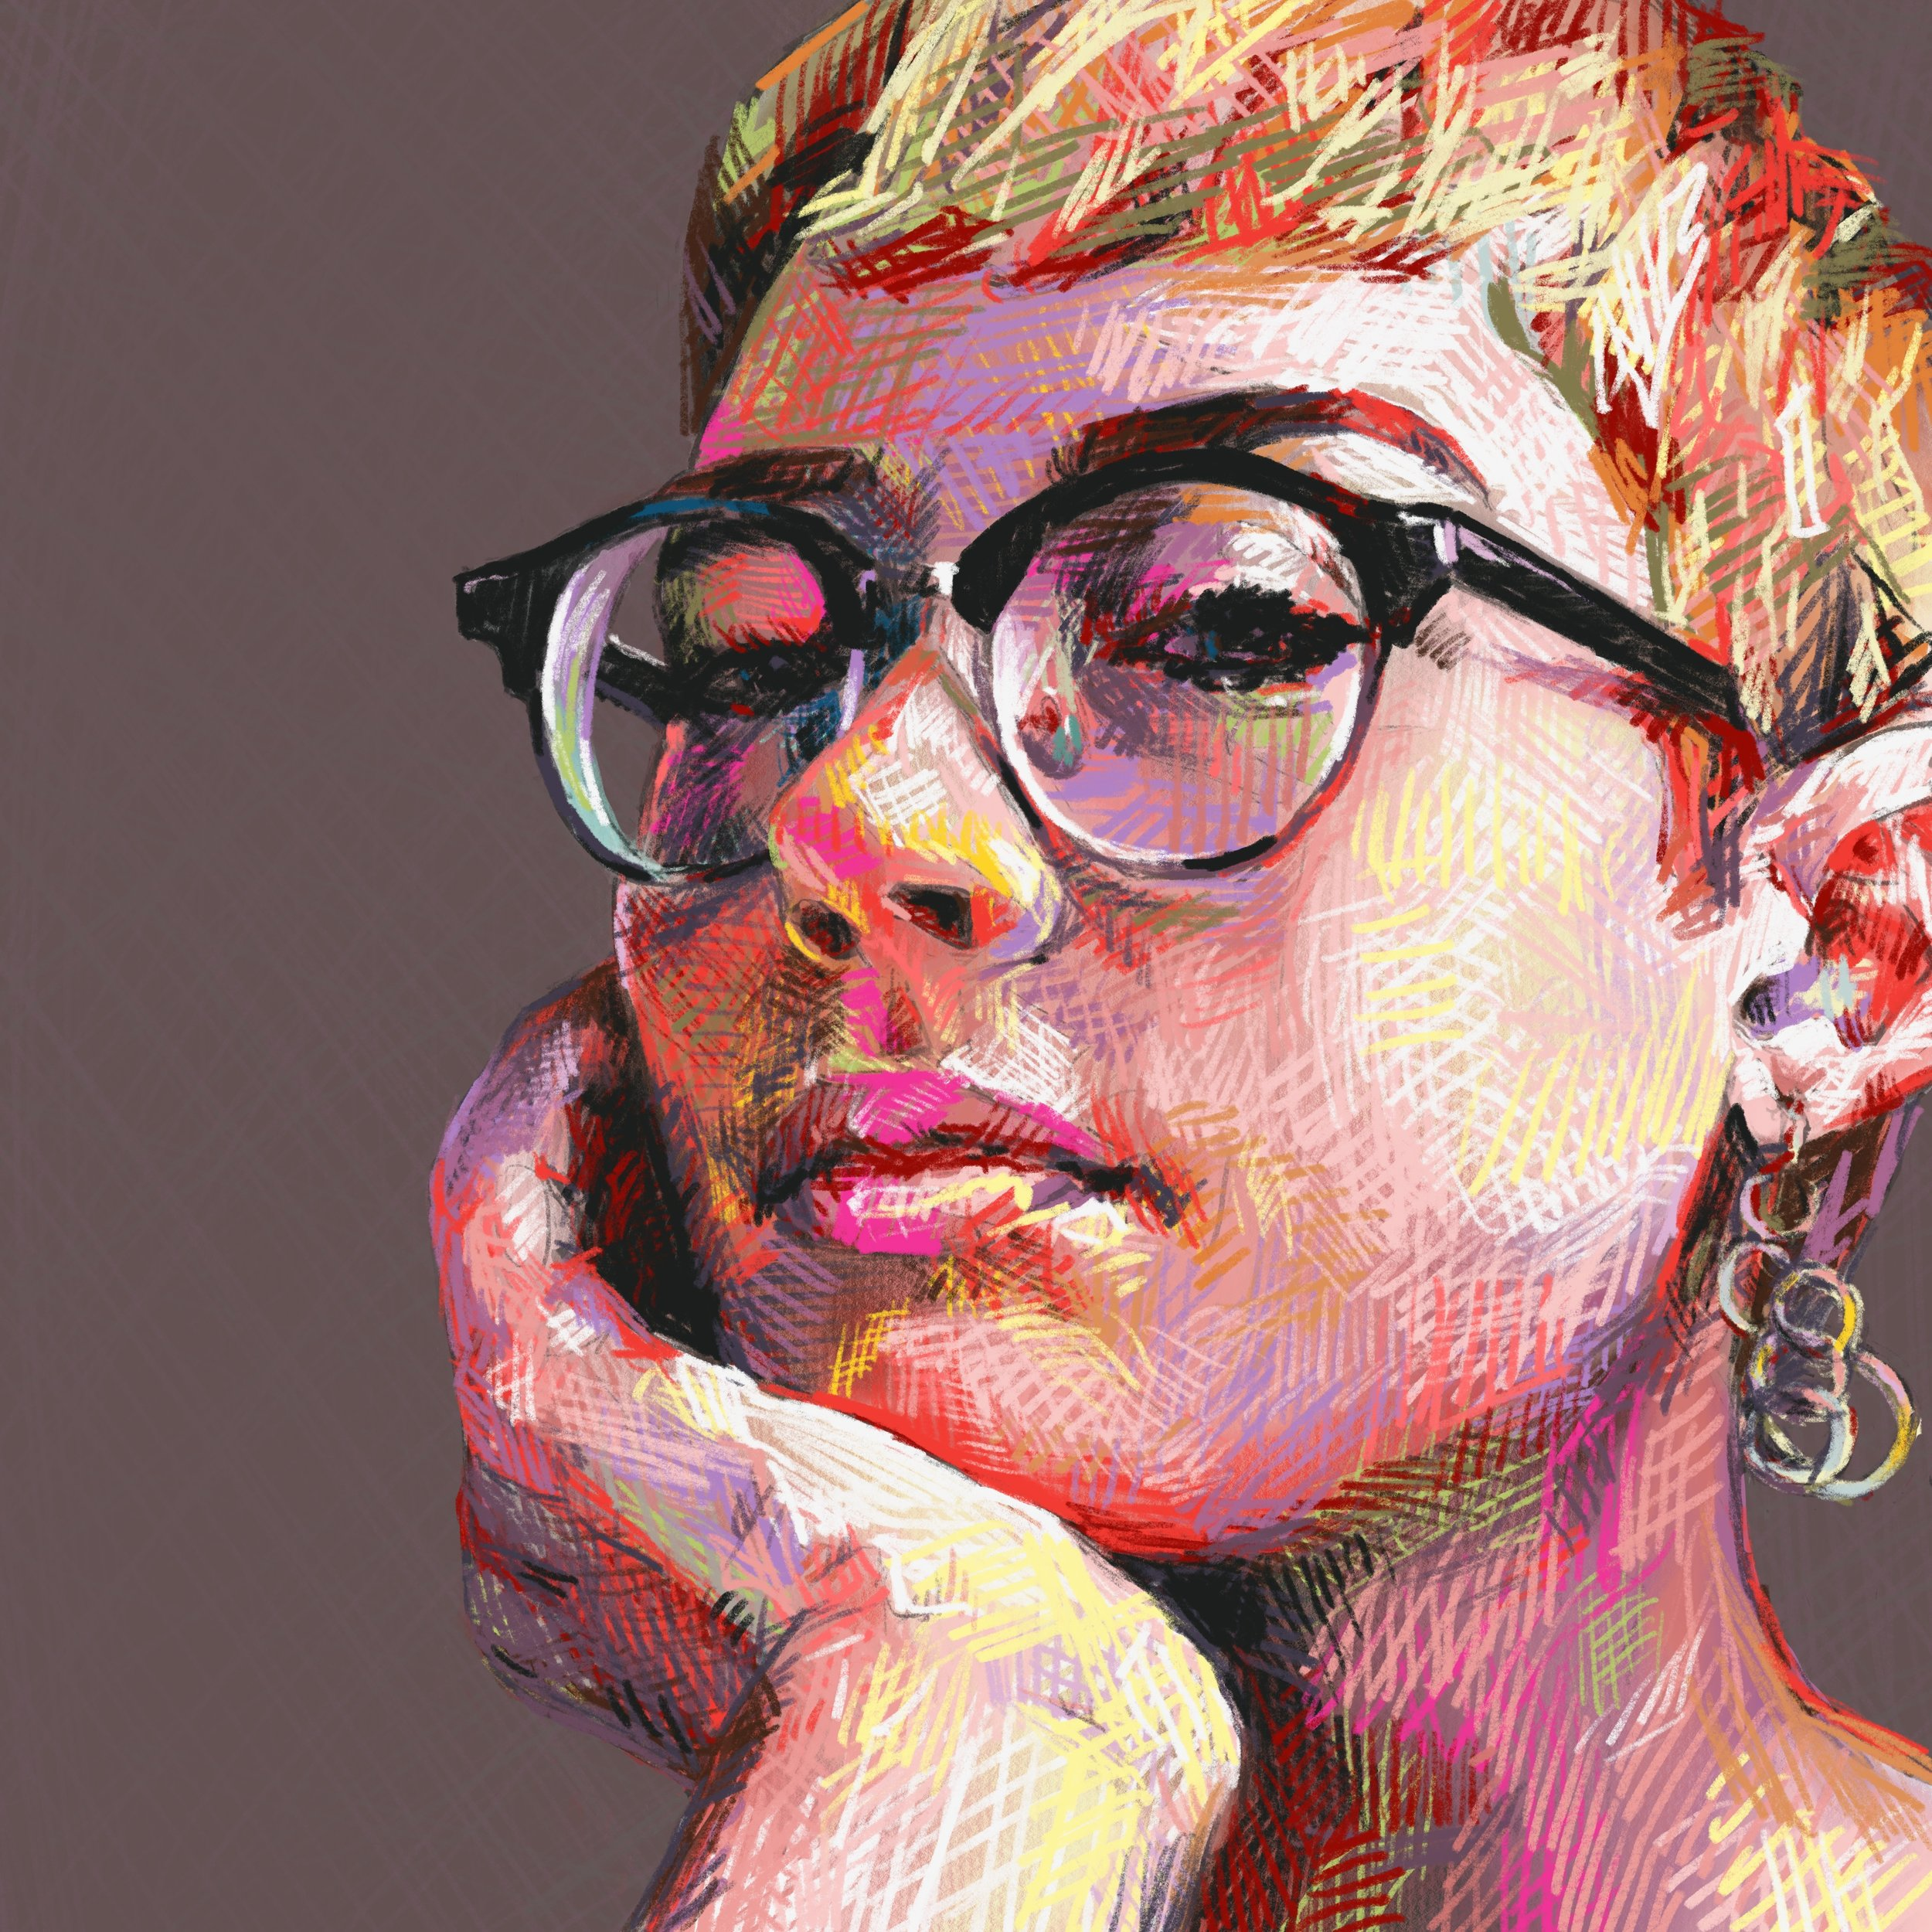 Lynn drawing.jpg